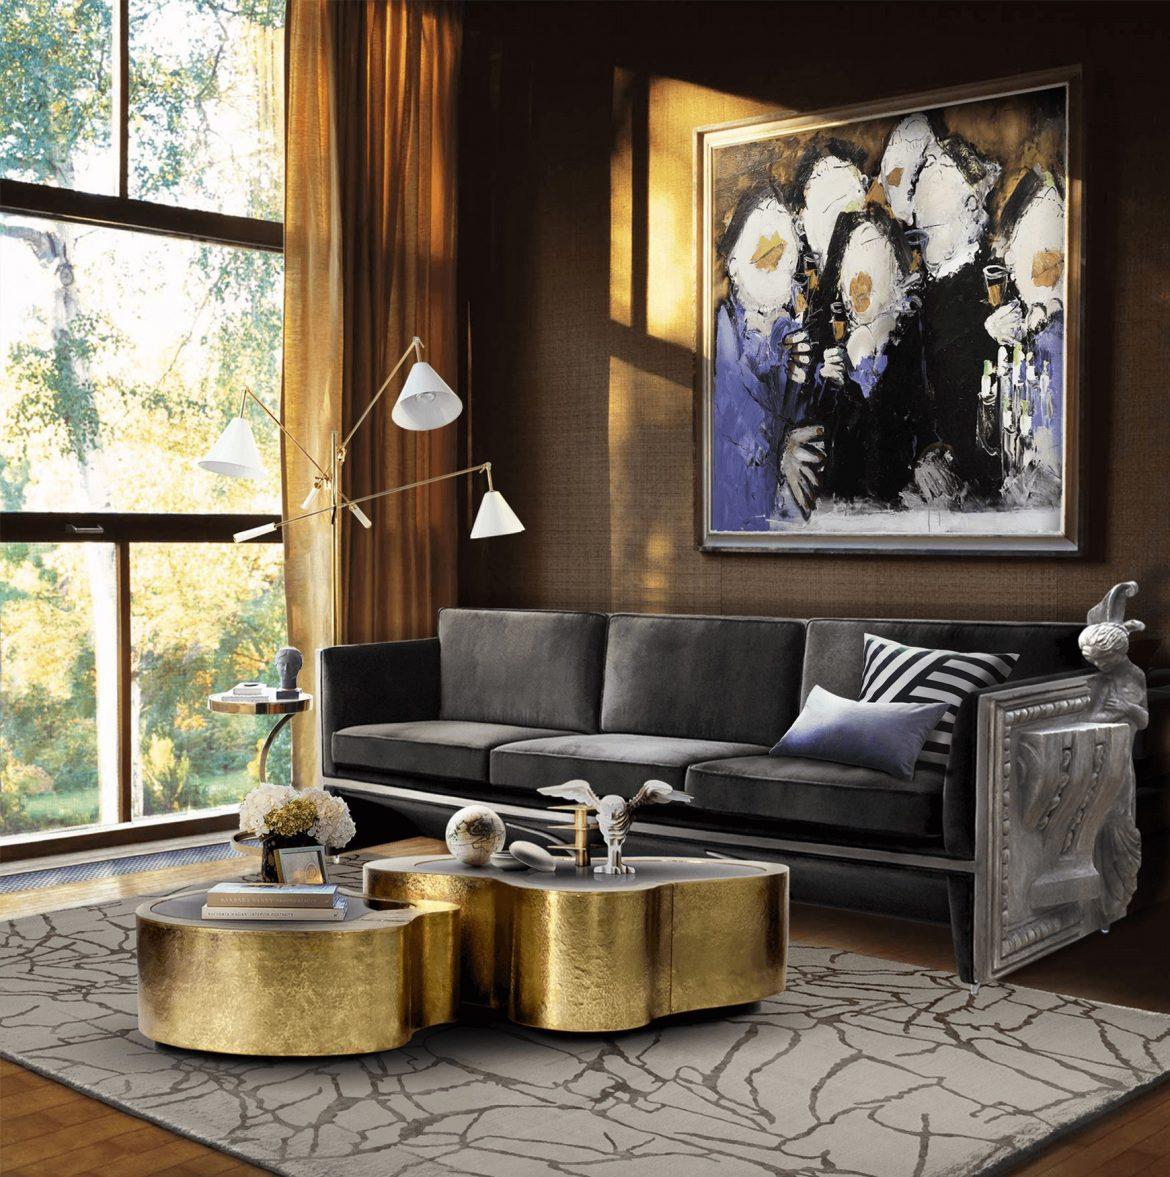 living room decor 7 Essential Tips For Living Room Decor essential tips for living room decor 5